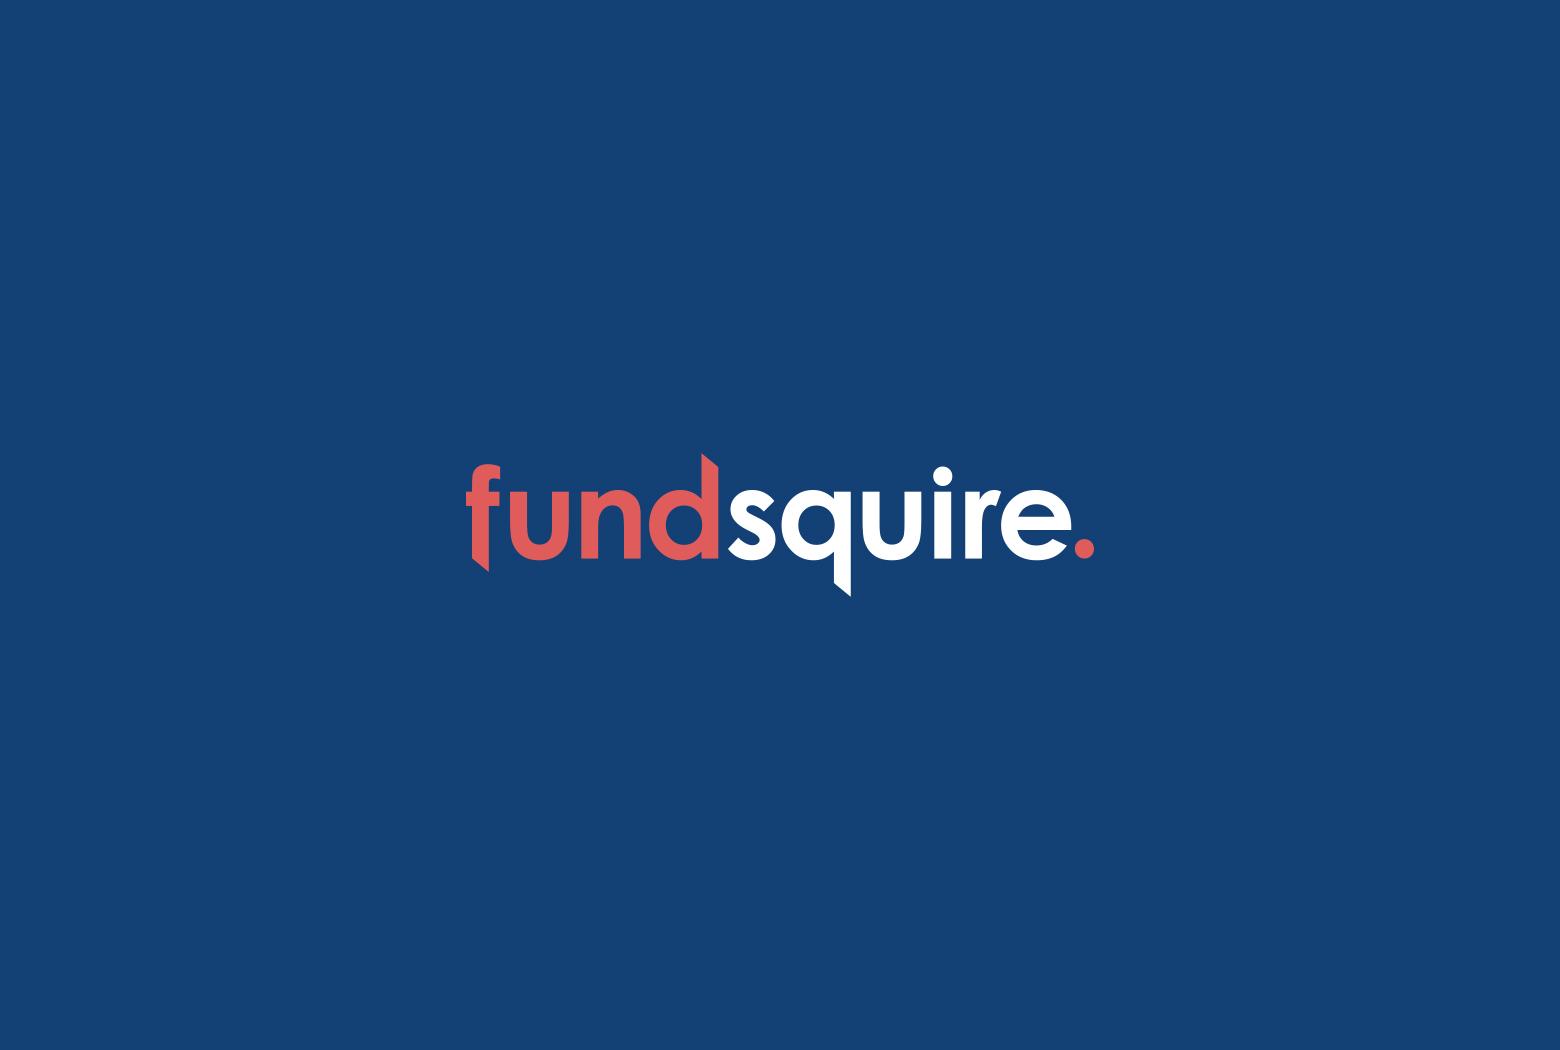 Nectar-&-Co-Fundsquire-Logo-Design-3.jpg